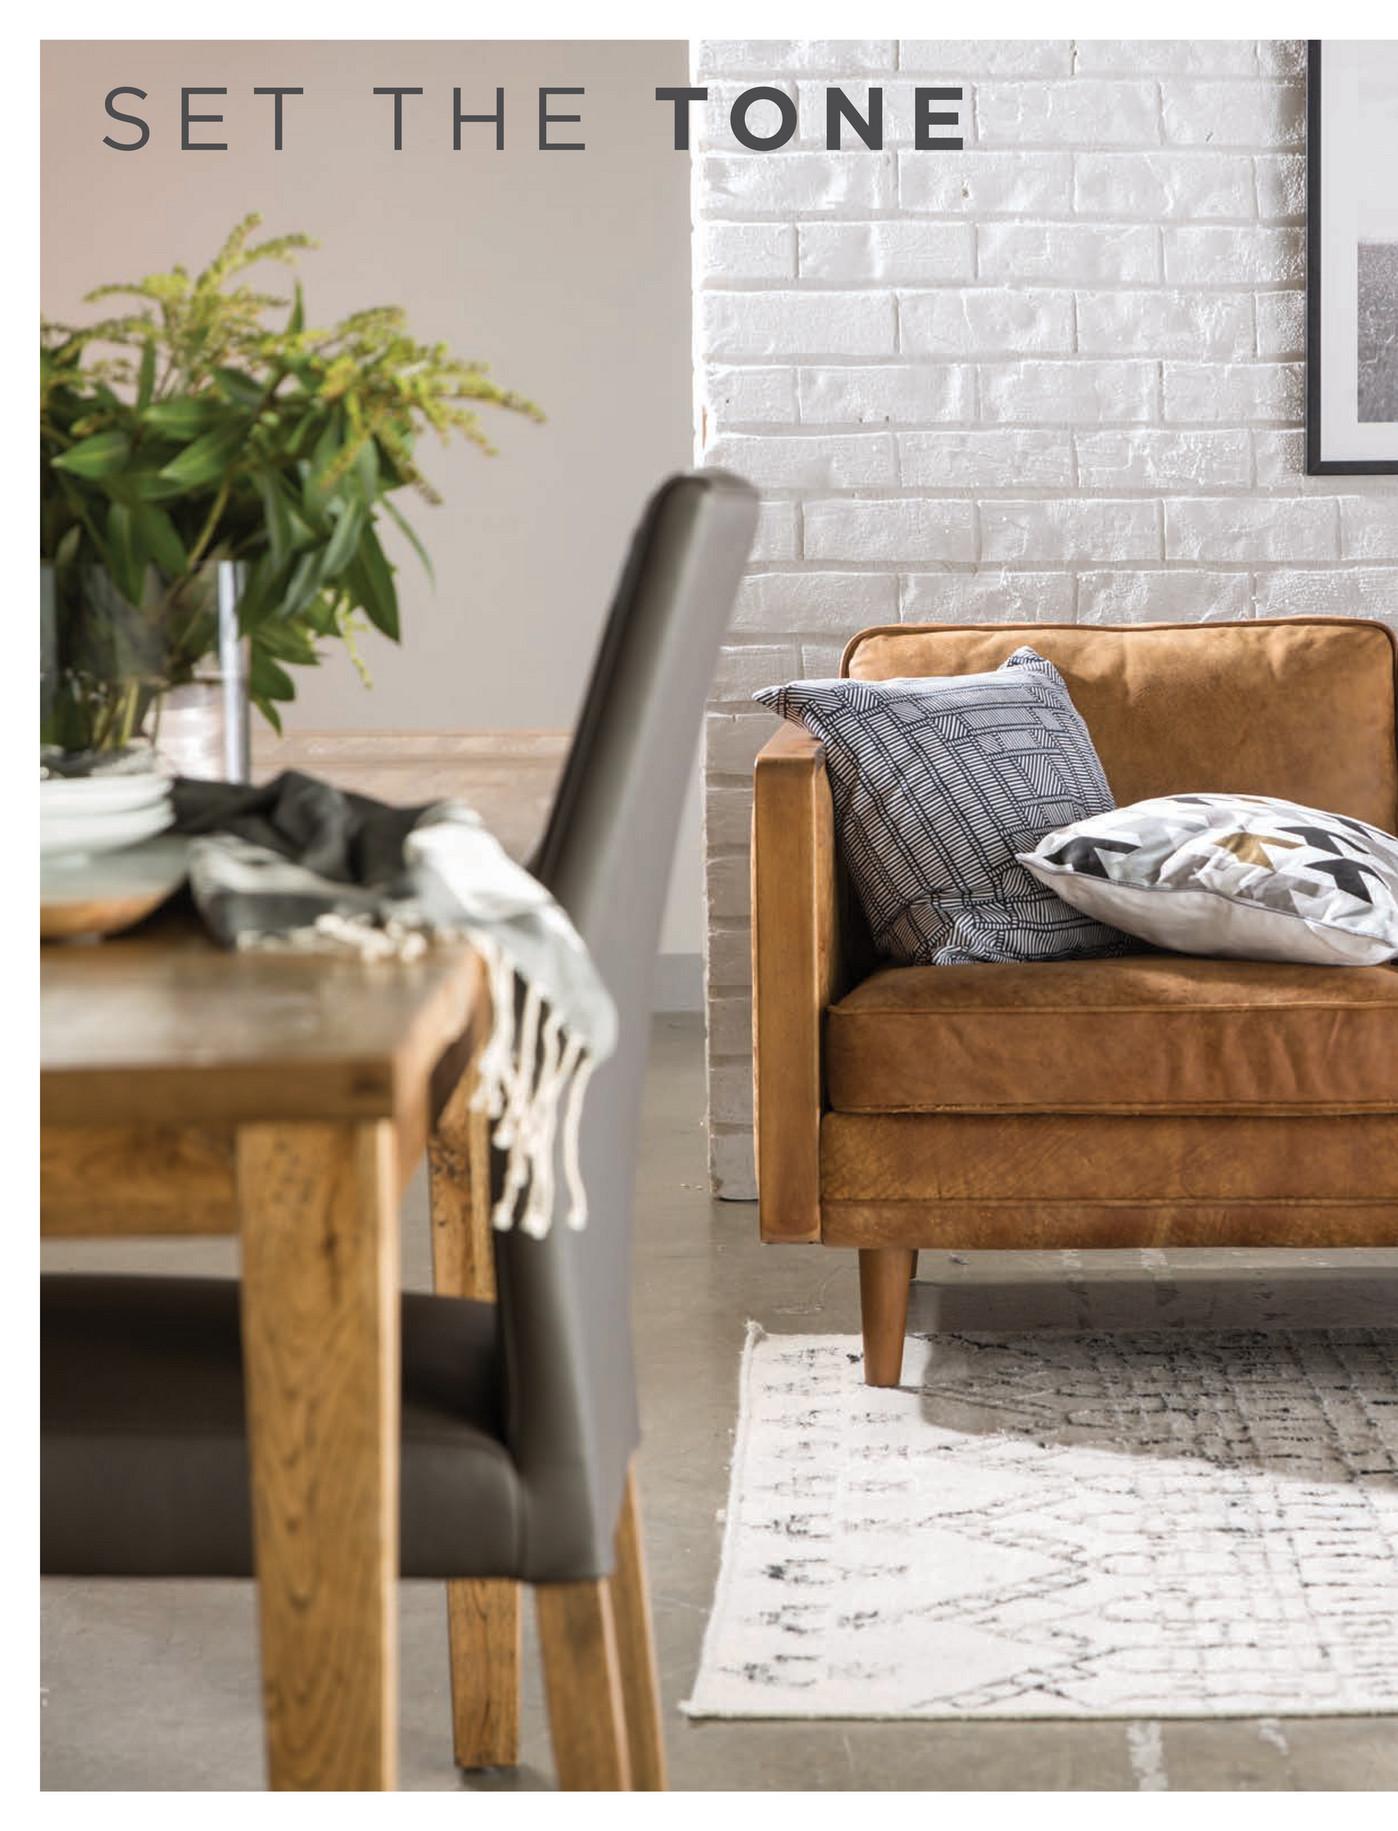 Strange Dare Gallery Spring Clean Sale On Now Keira 3 Seat Machost Co Dining Chair Design Ideas Machostcouk